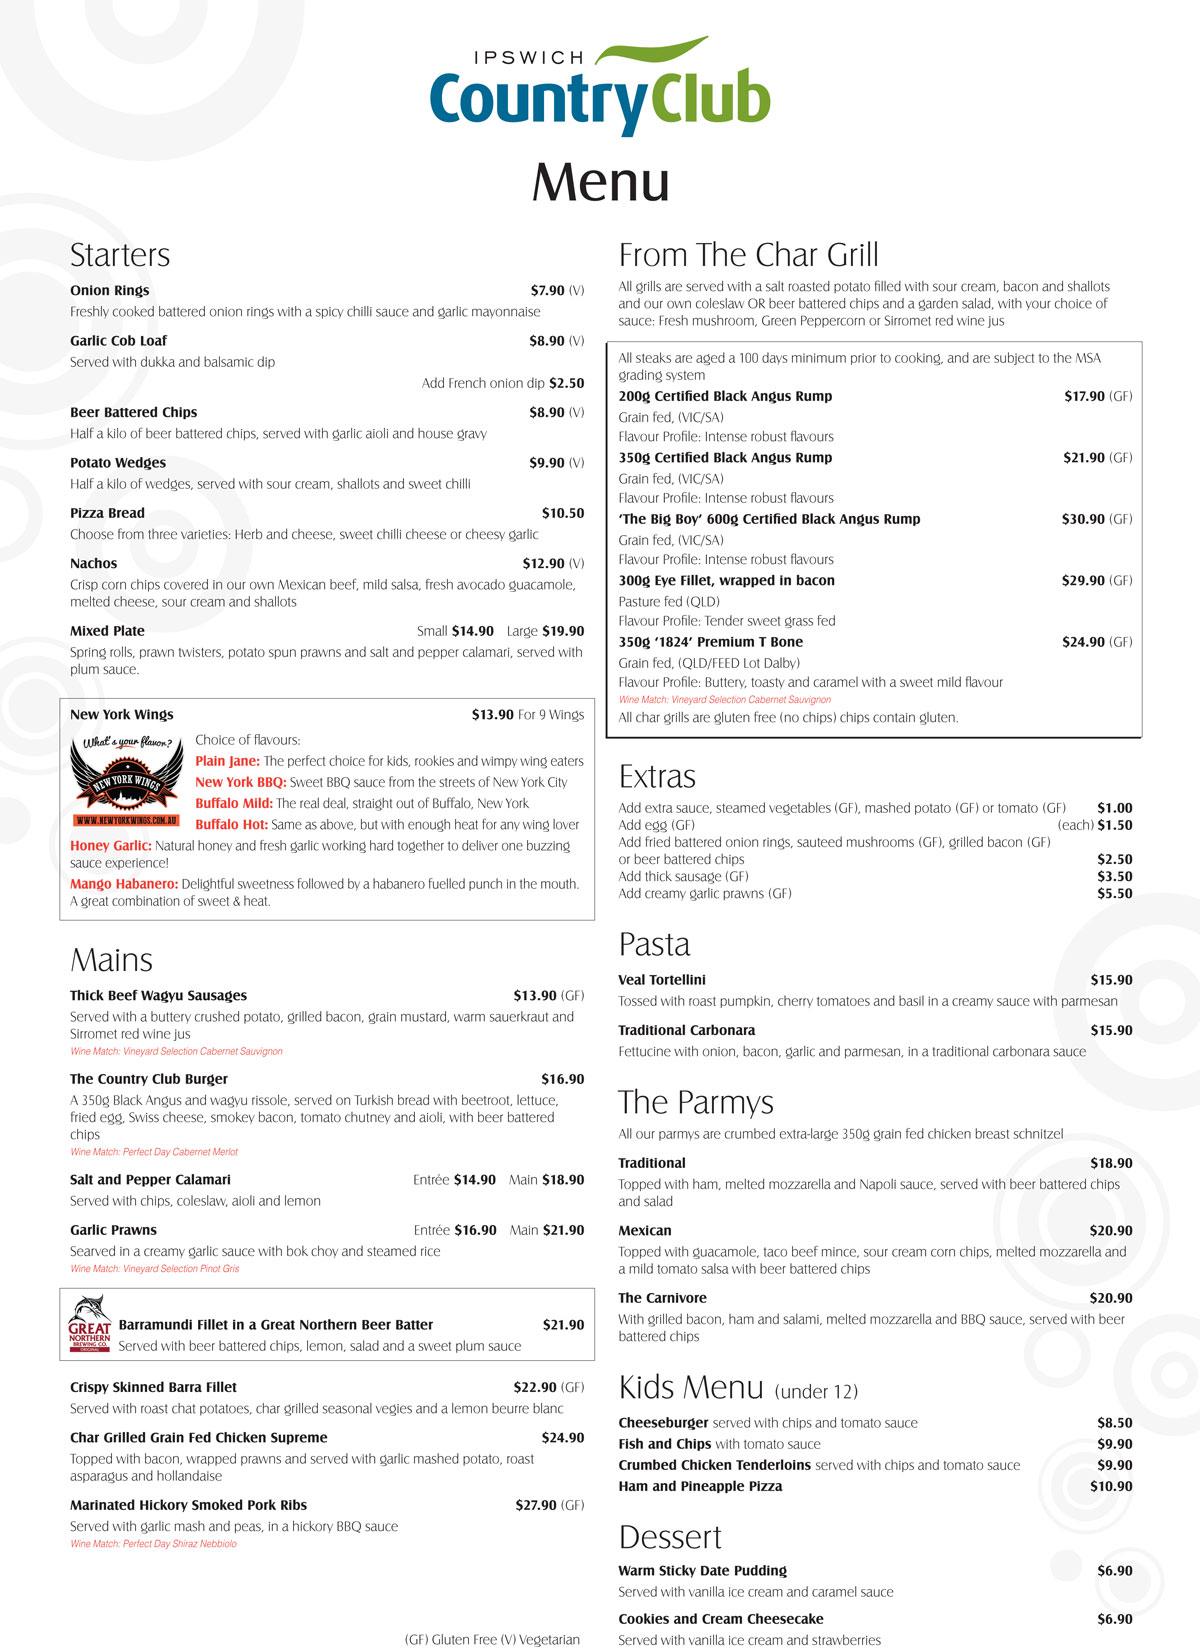 ipswich-menu-new-10-15-a3_1449553278-1